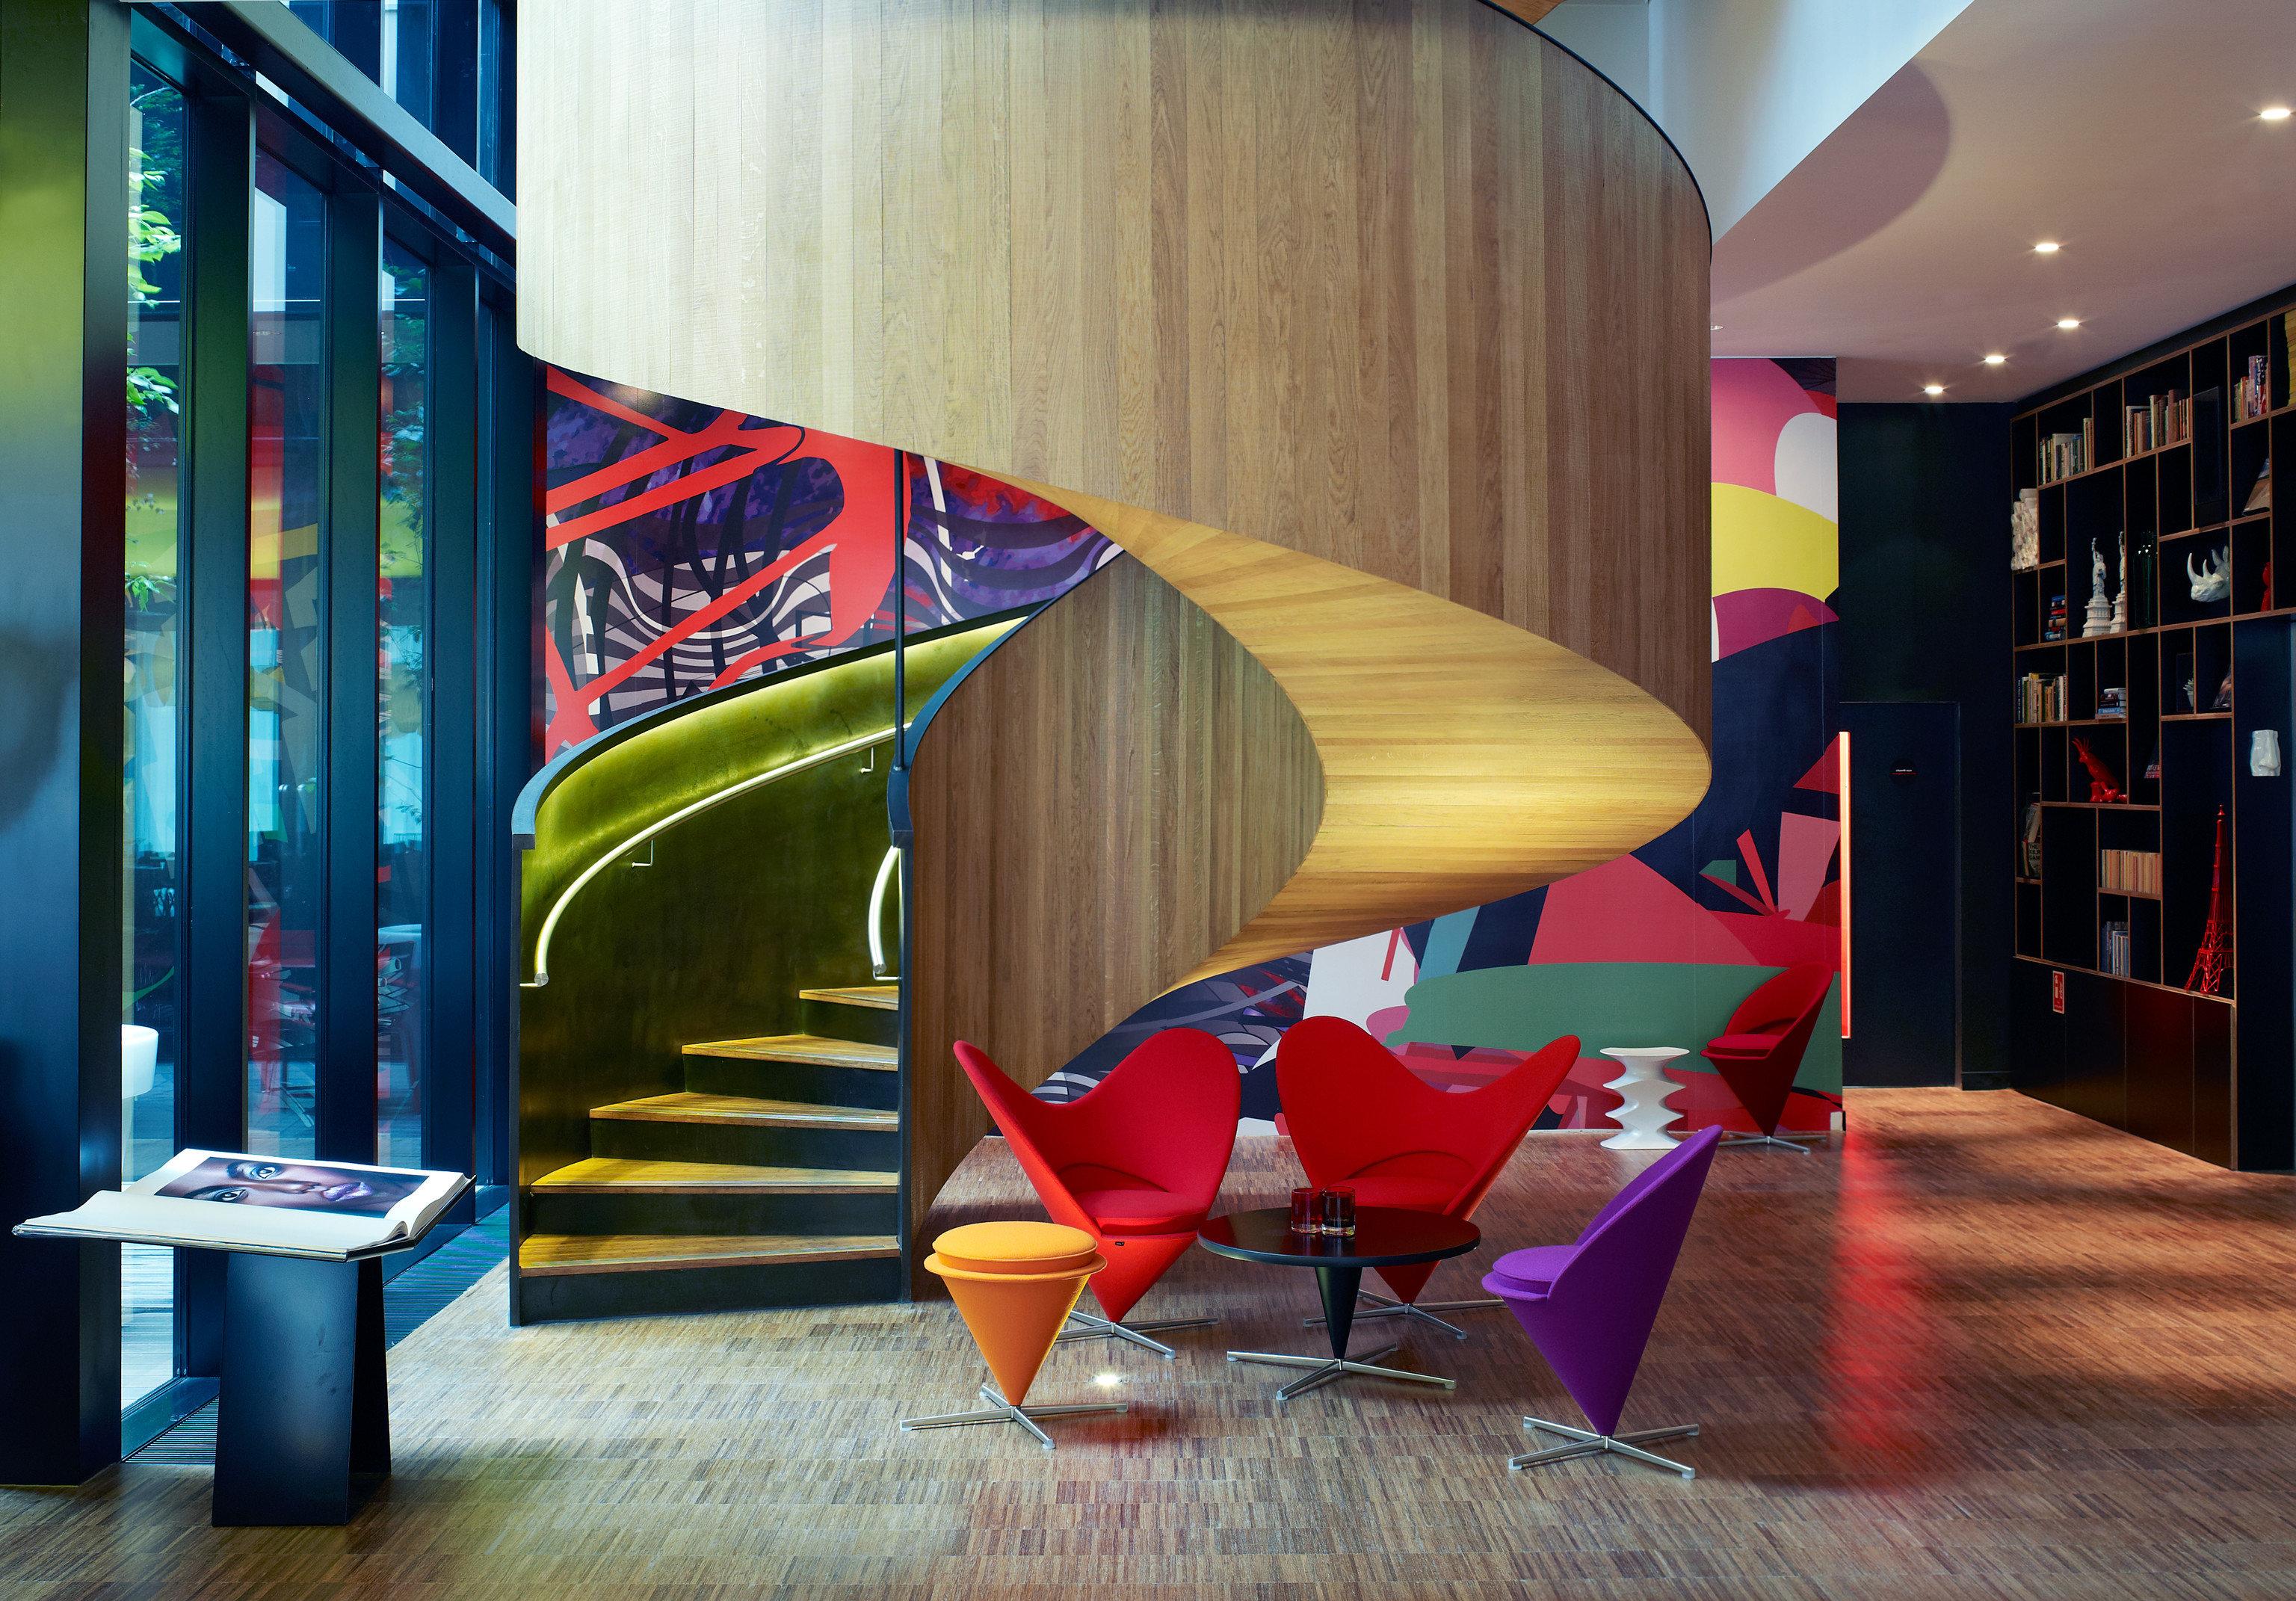 Budget Hotels London Trip Ideas floor indoor color room interior design art Lobby Design furniture